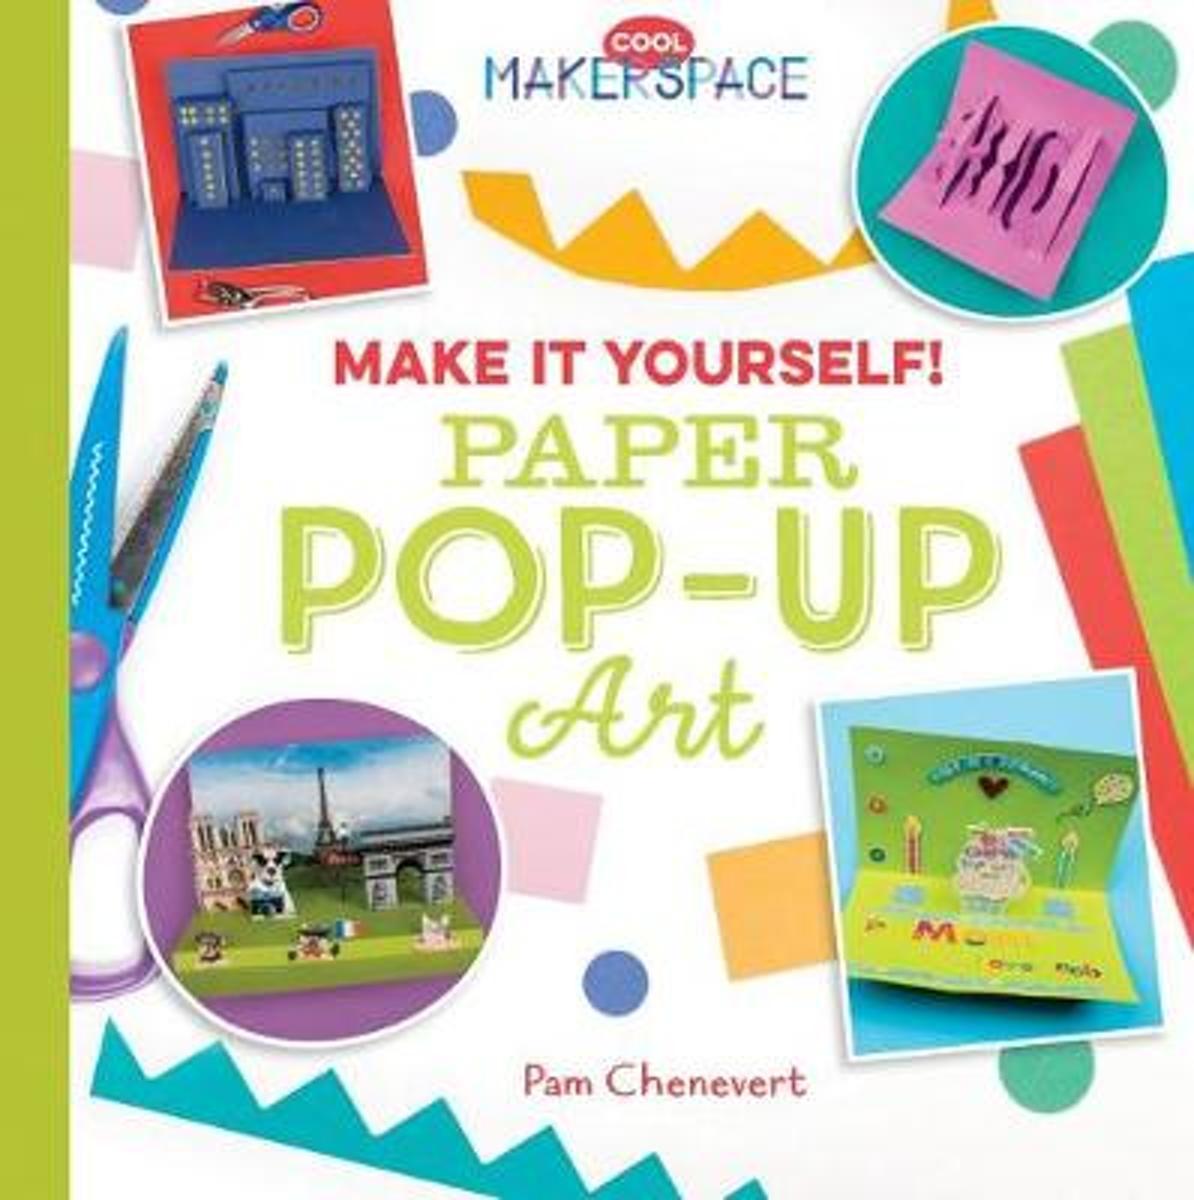 Make it Yourself! Paper Pop-Up Art.jpg